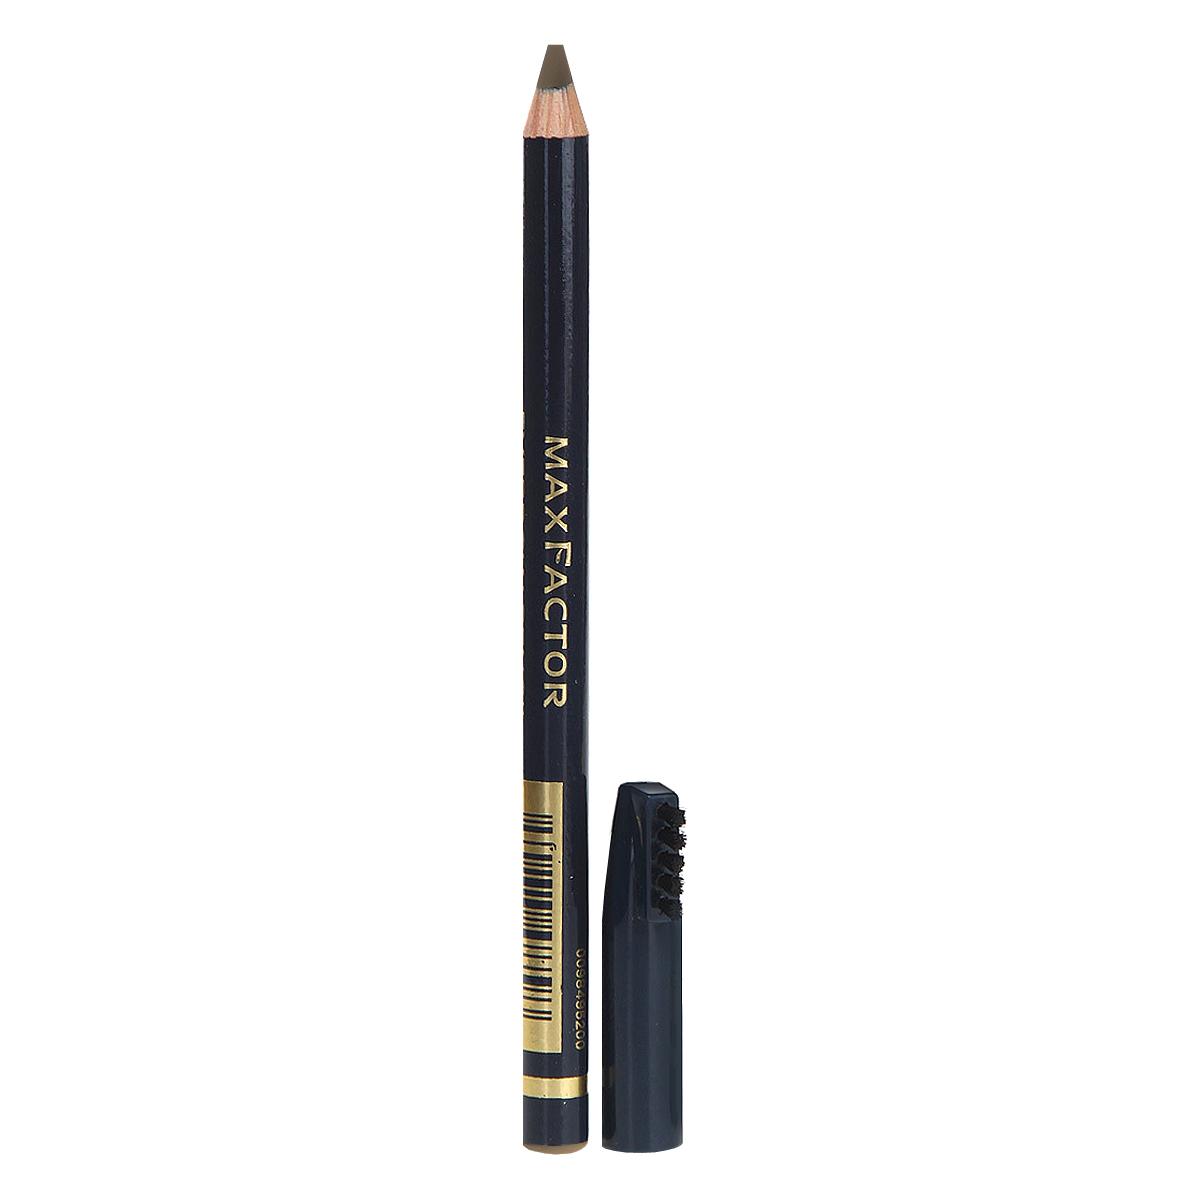 Max Factor Карандаш для бровей Eyebrow Pencil, тон №02 Hazel, цвет: светло-коричневый max factor карандаш для глаз liquid effect pencil тон 05 brown blaze цвет коричневый